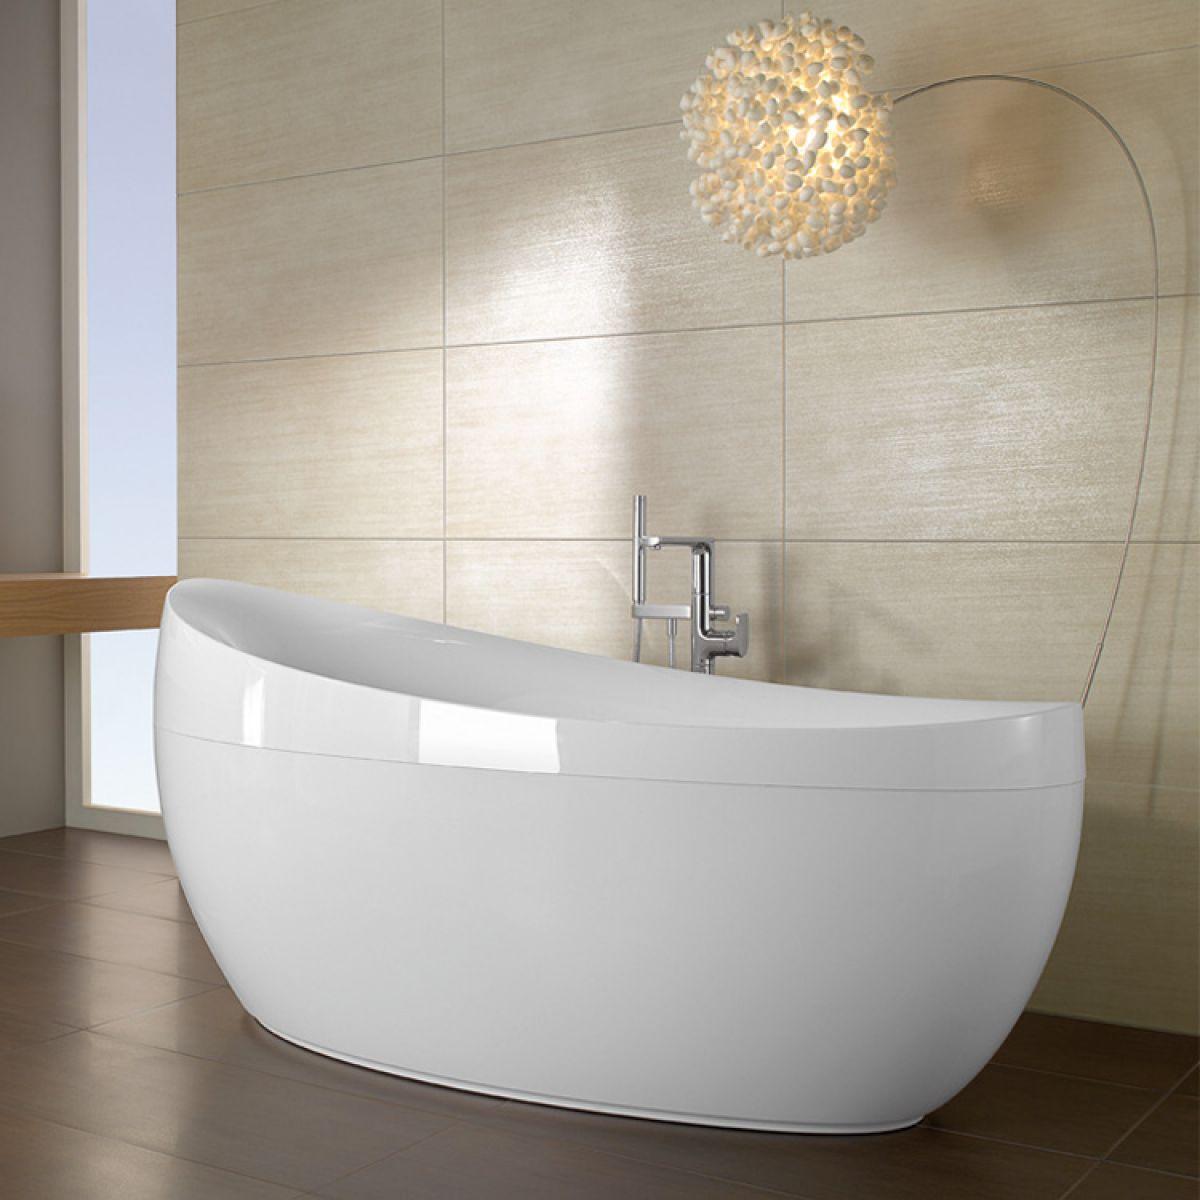 Villeroy & Boch Aveo Freestanding Bath